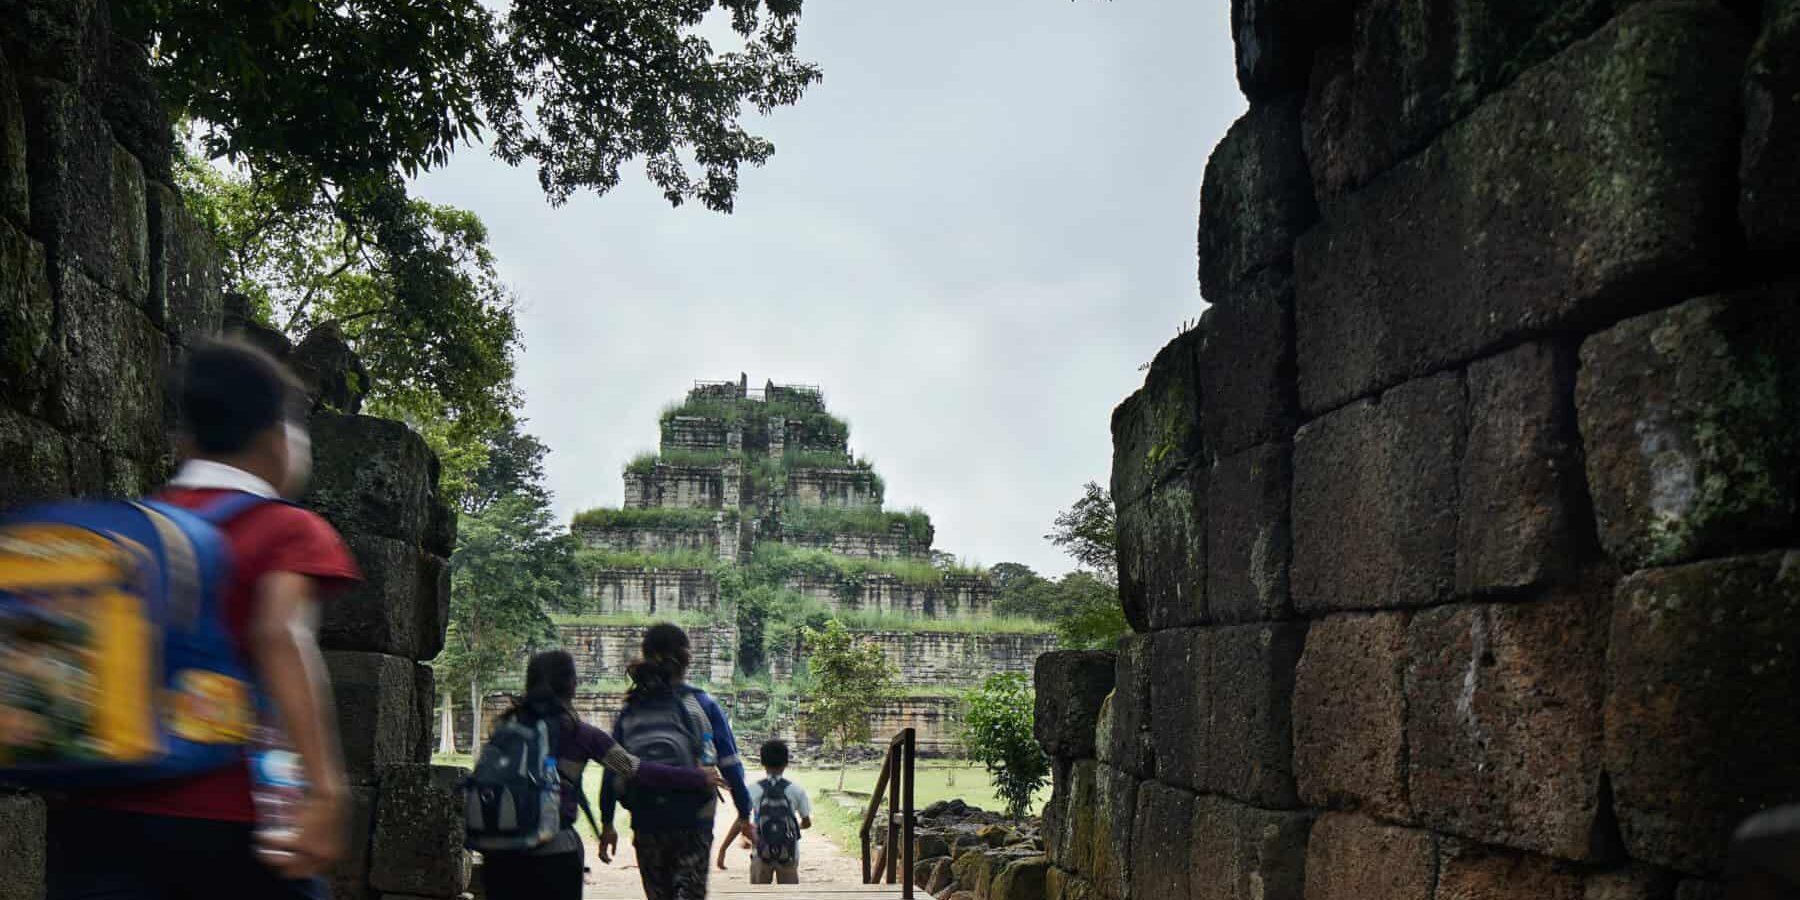 School children visiting Koh Ker temple in the vast temple of angkor complex